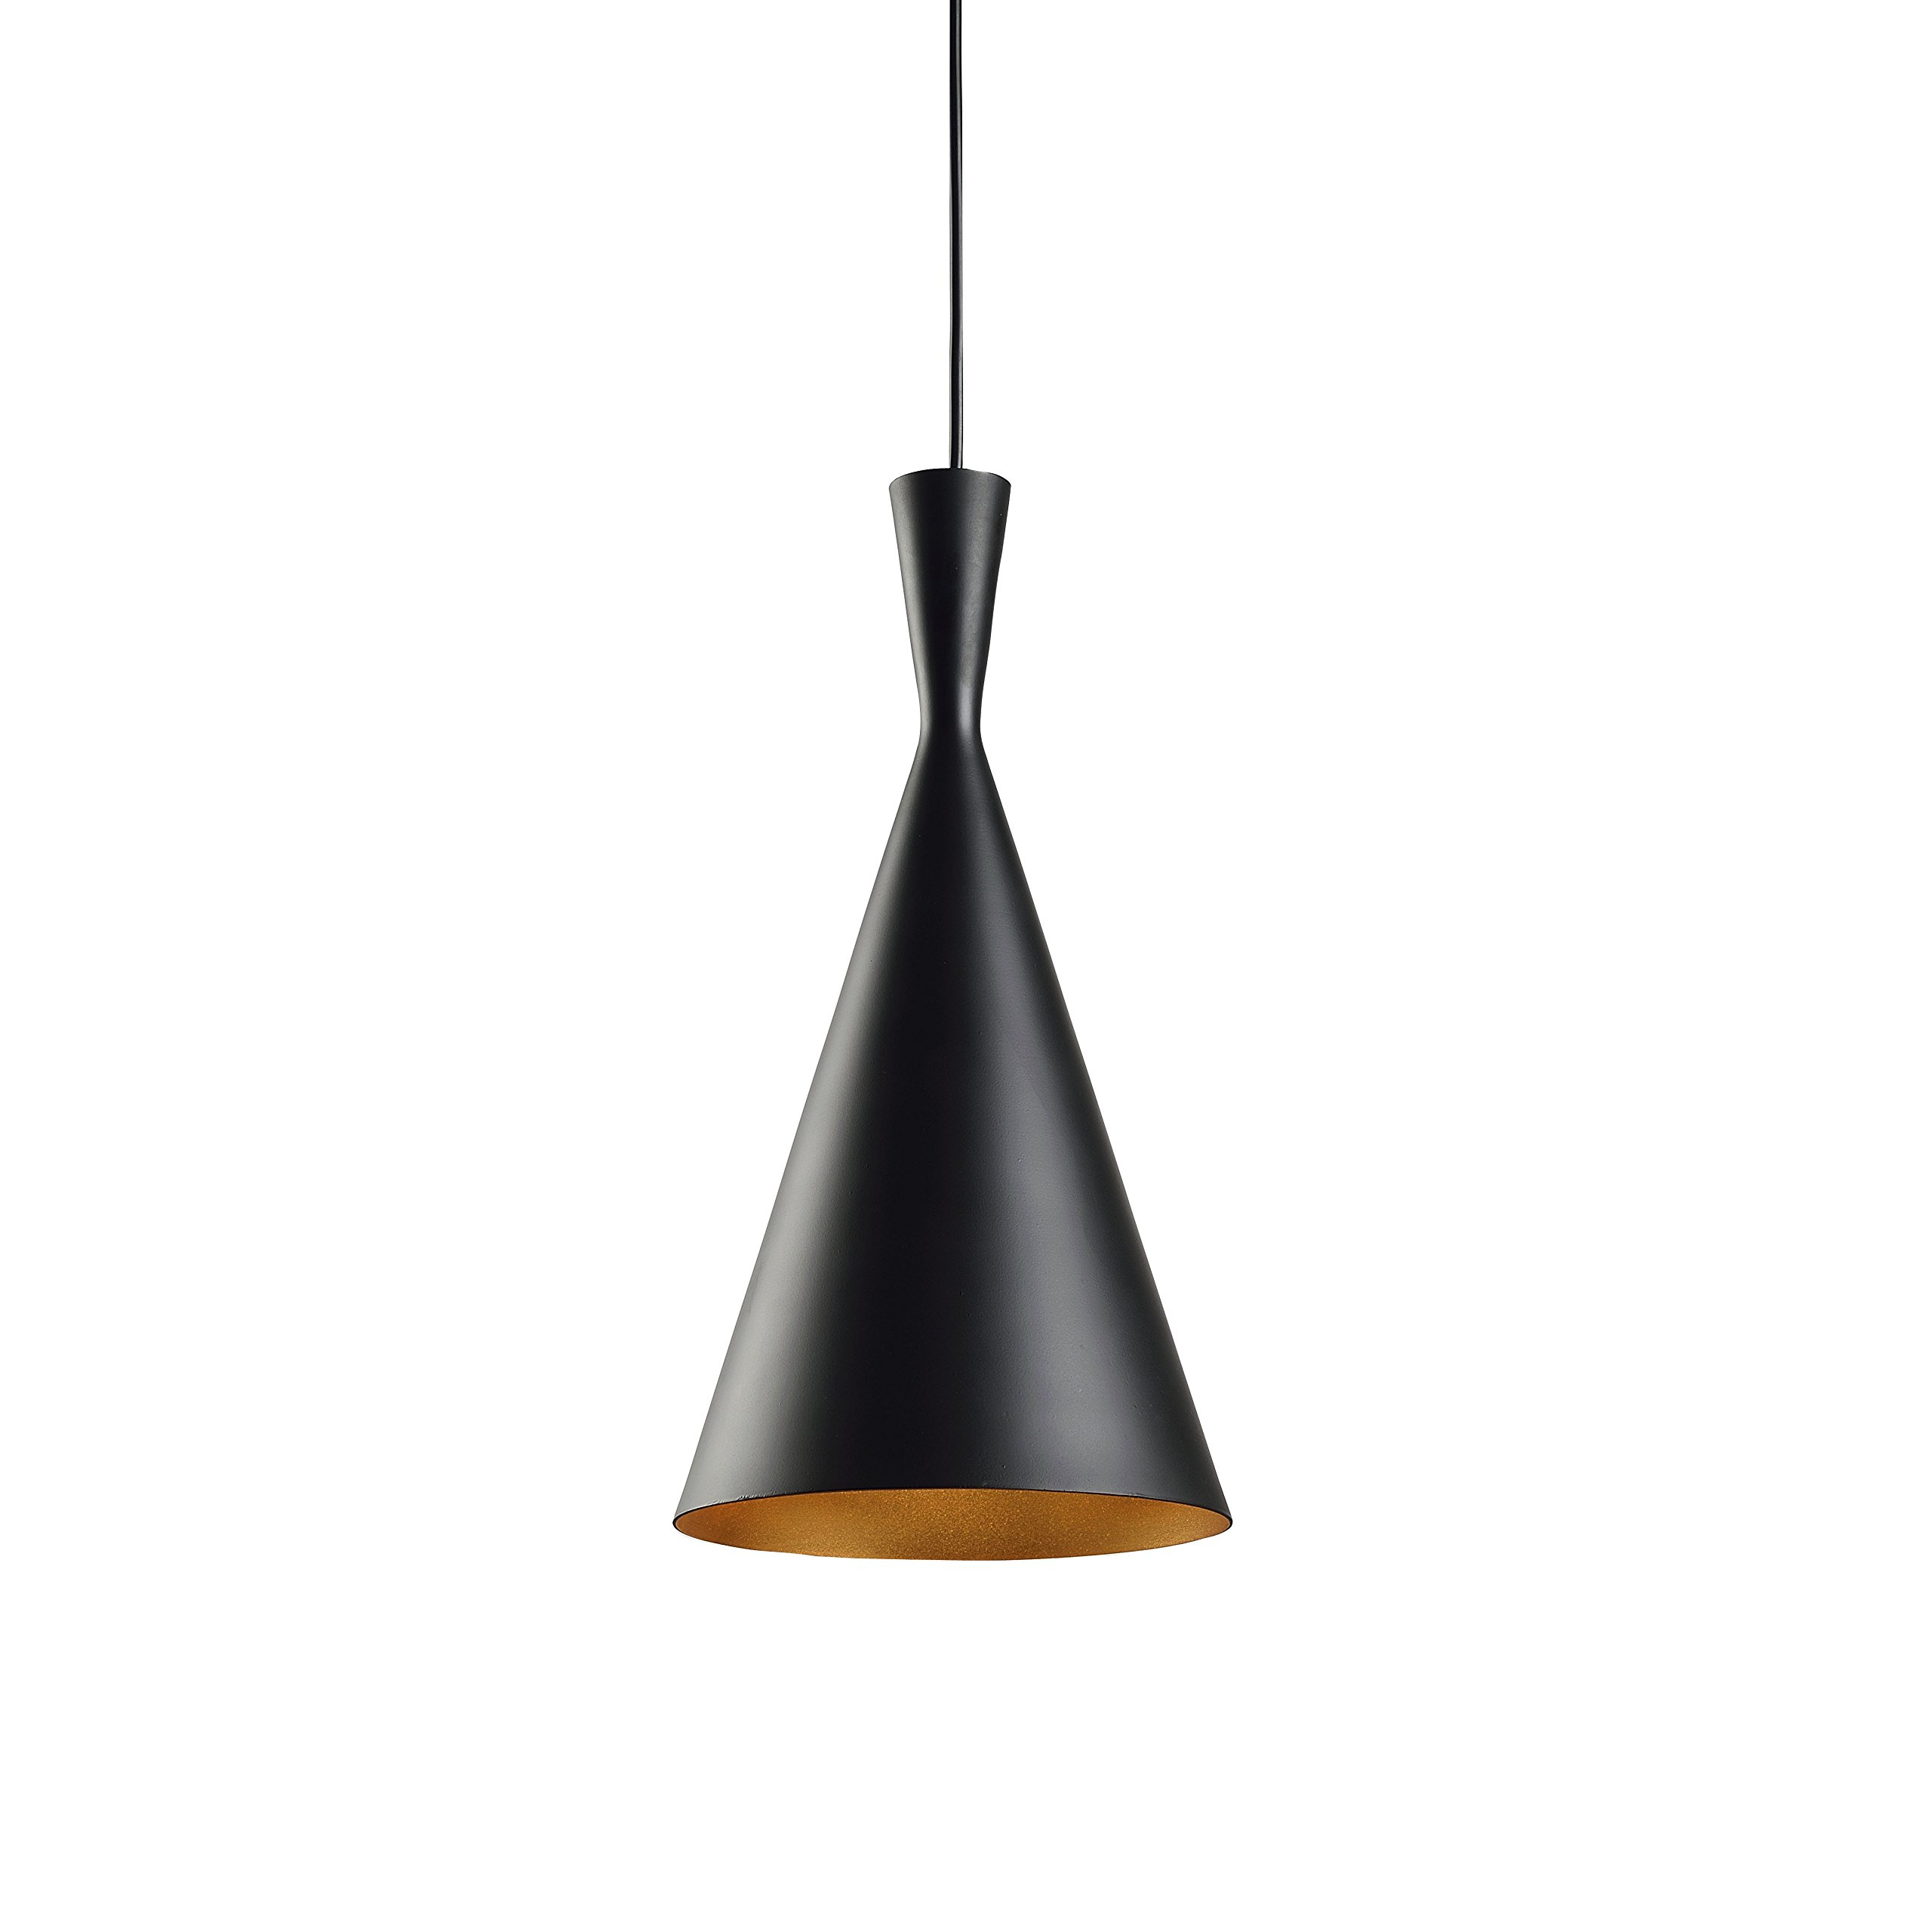 Ceiling Light Kitchen Island Pendant - Black Aluminum Fixture